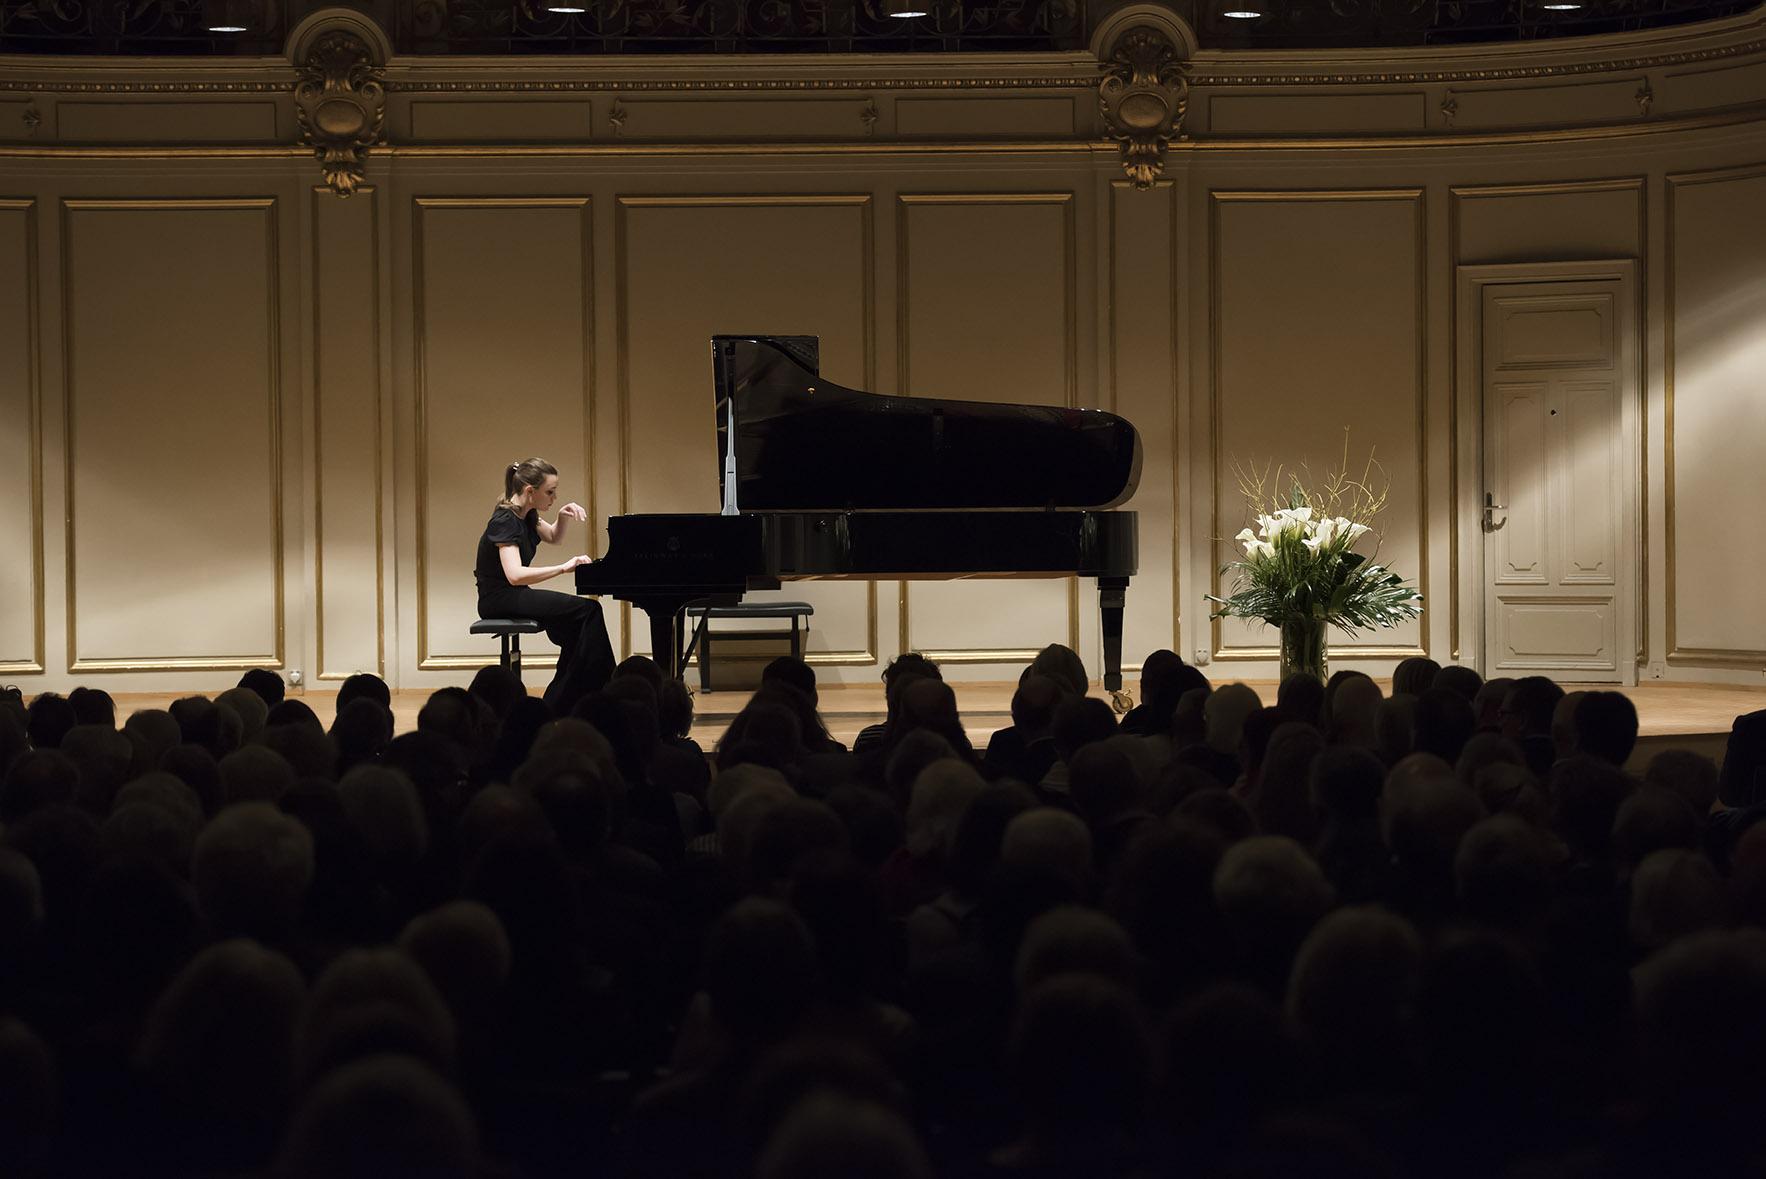 Chiara Opalio, 1. Preisträgerin Rahn Musikpreis 2016, V. Rahn Continuo Konzert 2017